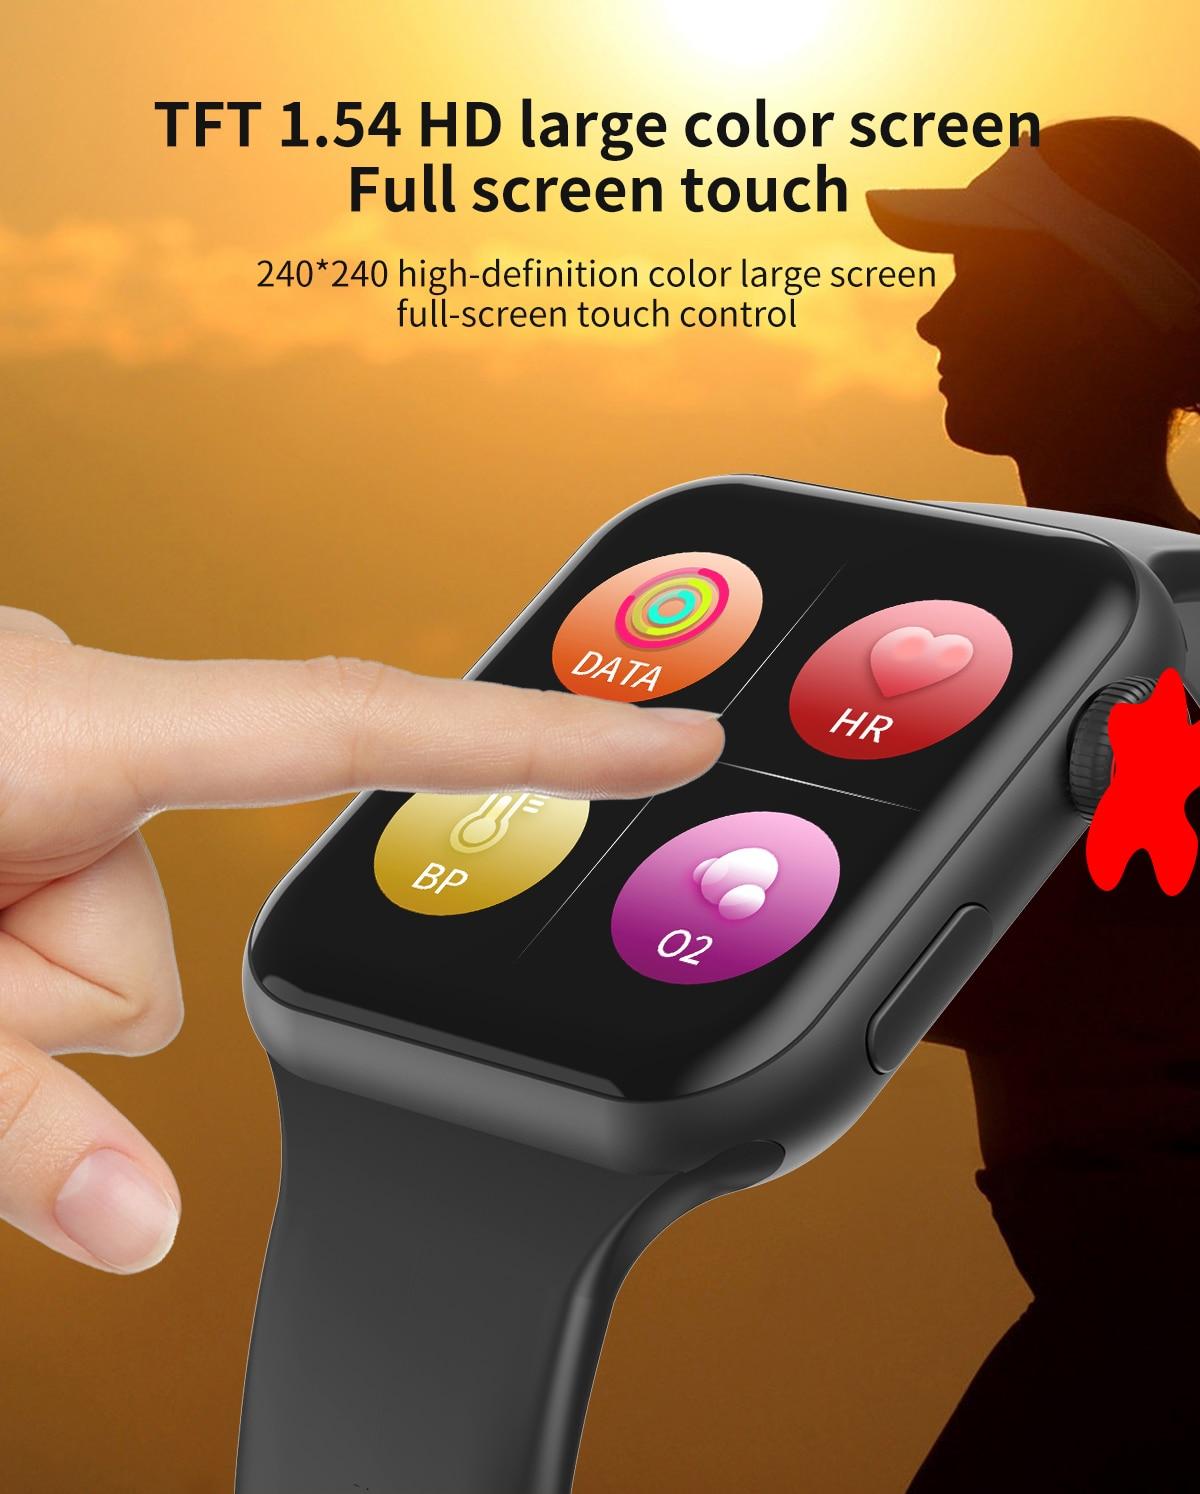 H1d592ffdc7834d9d88ebafe047c8fd9cK 696 New Style F10 Smart Watch Full touch screen Bluetooth Smartwatch Music Camera Heart Rate Monitor Waterproof Smart Bracelet